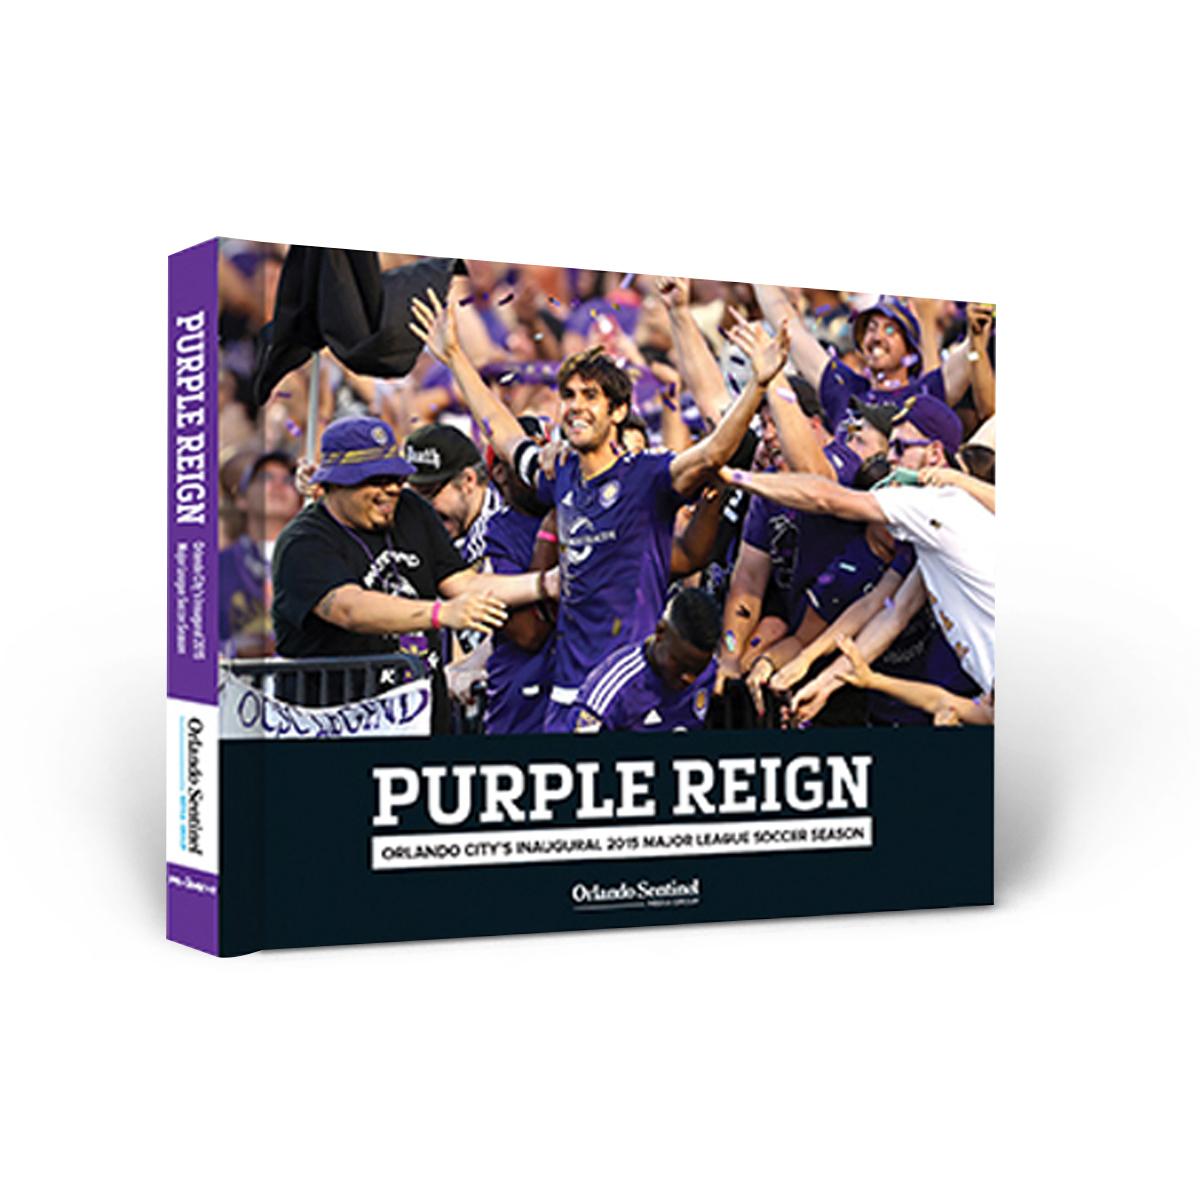 """Purple Reign: Orlando City's Inaugural 2015 Major League Soccer Season"" Book"